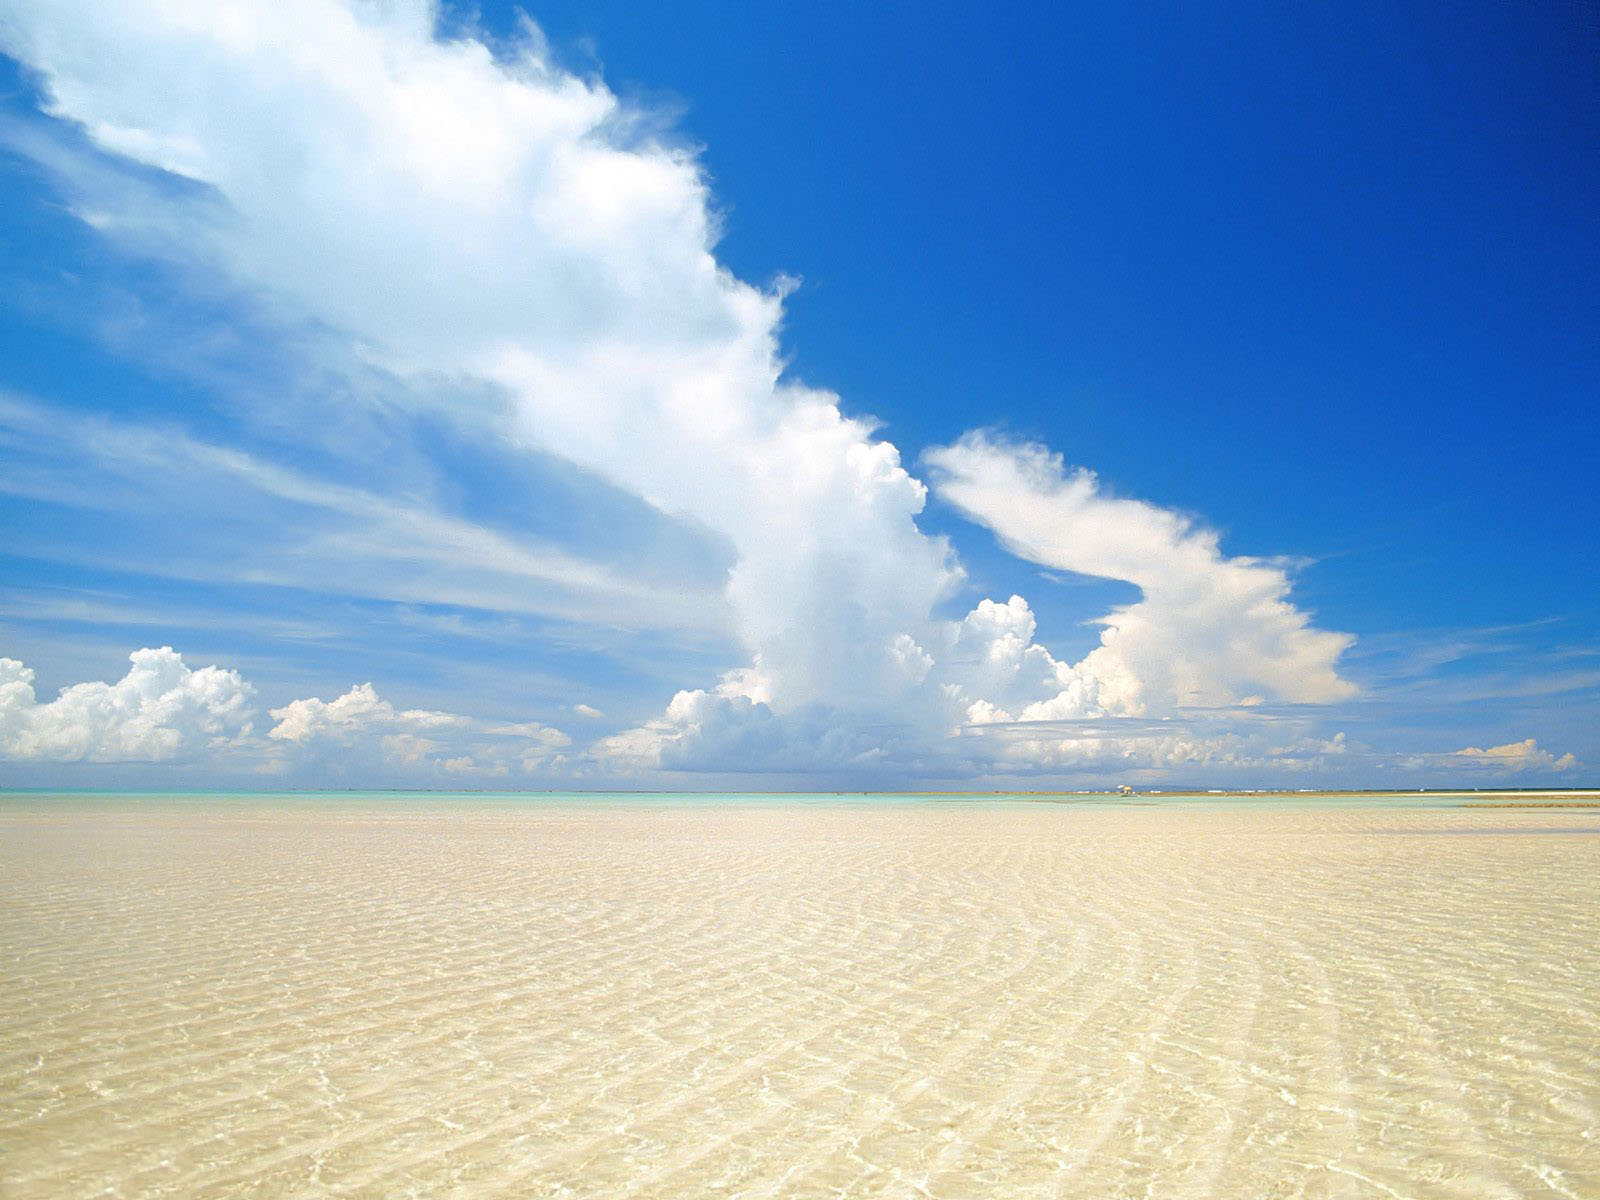 природа море горизонт небо облака пляж берег отдых nature sea horizon the sky clouds beach shore rest  № 821543 без смс